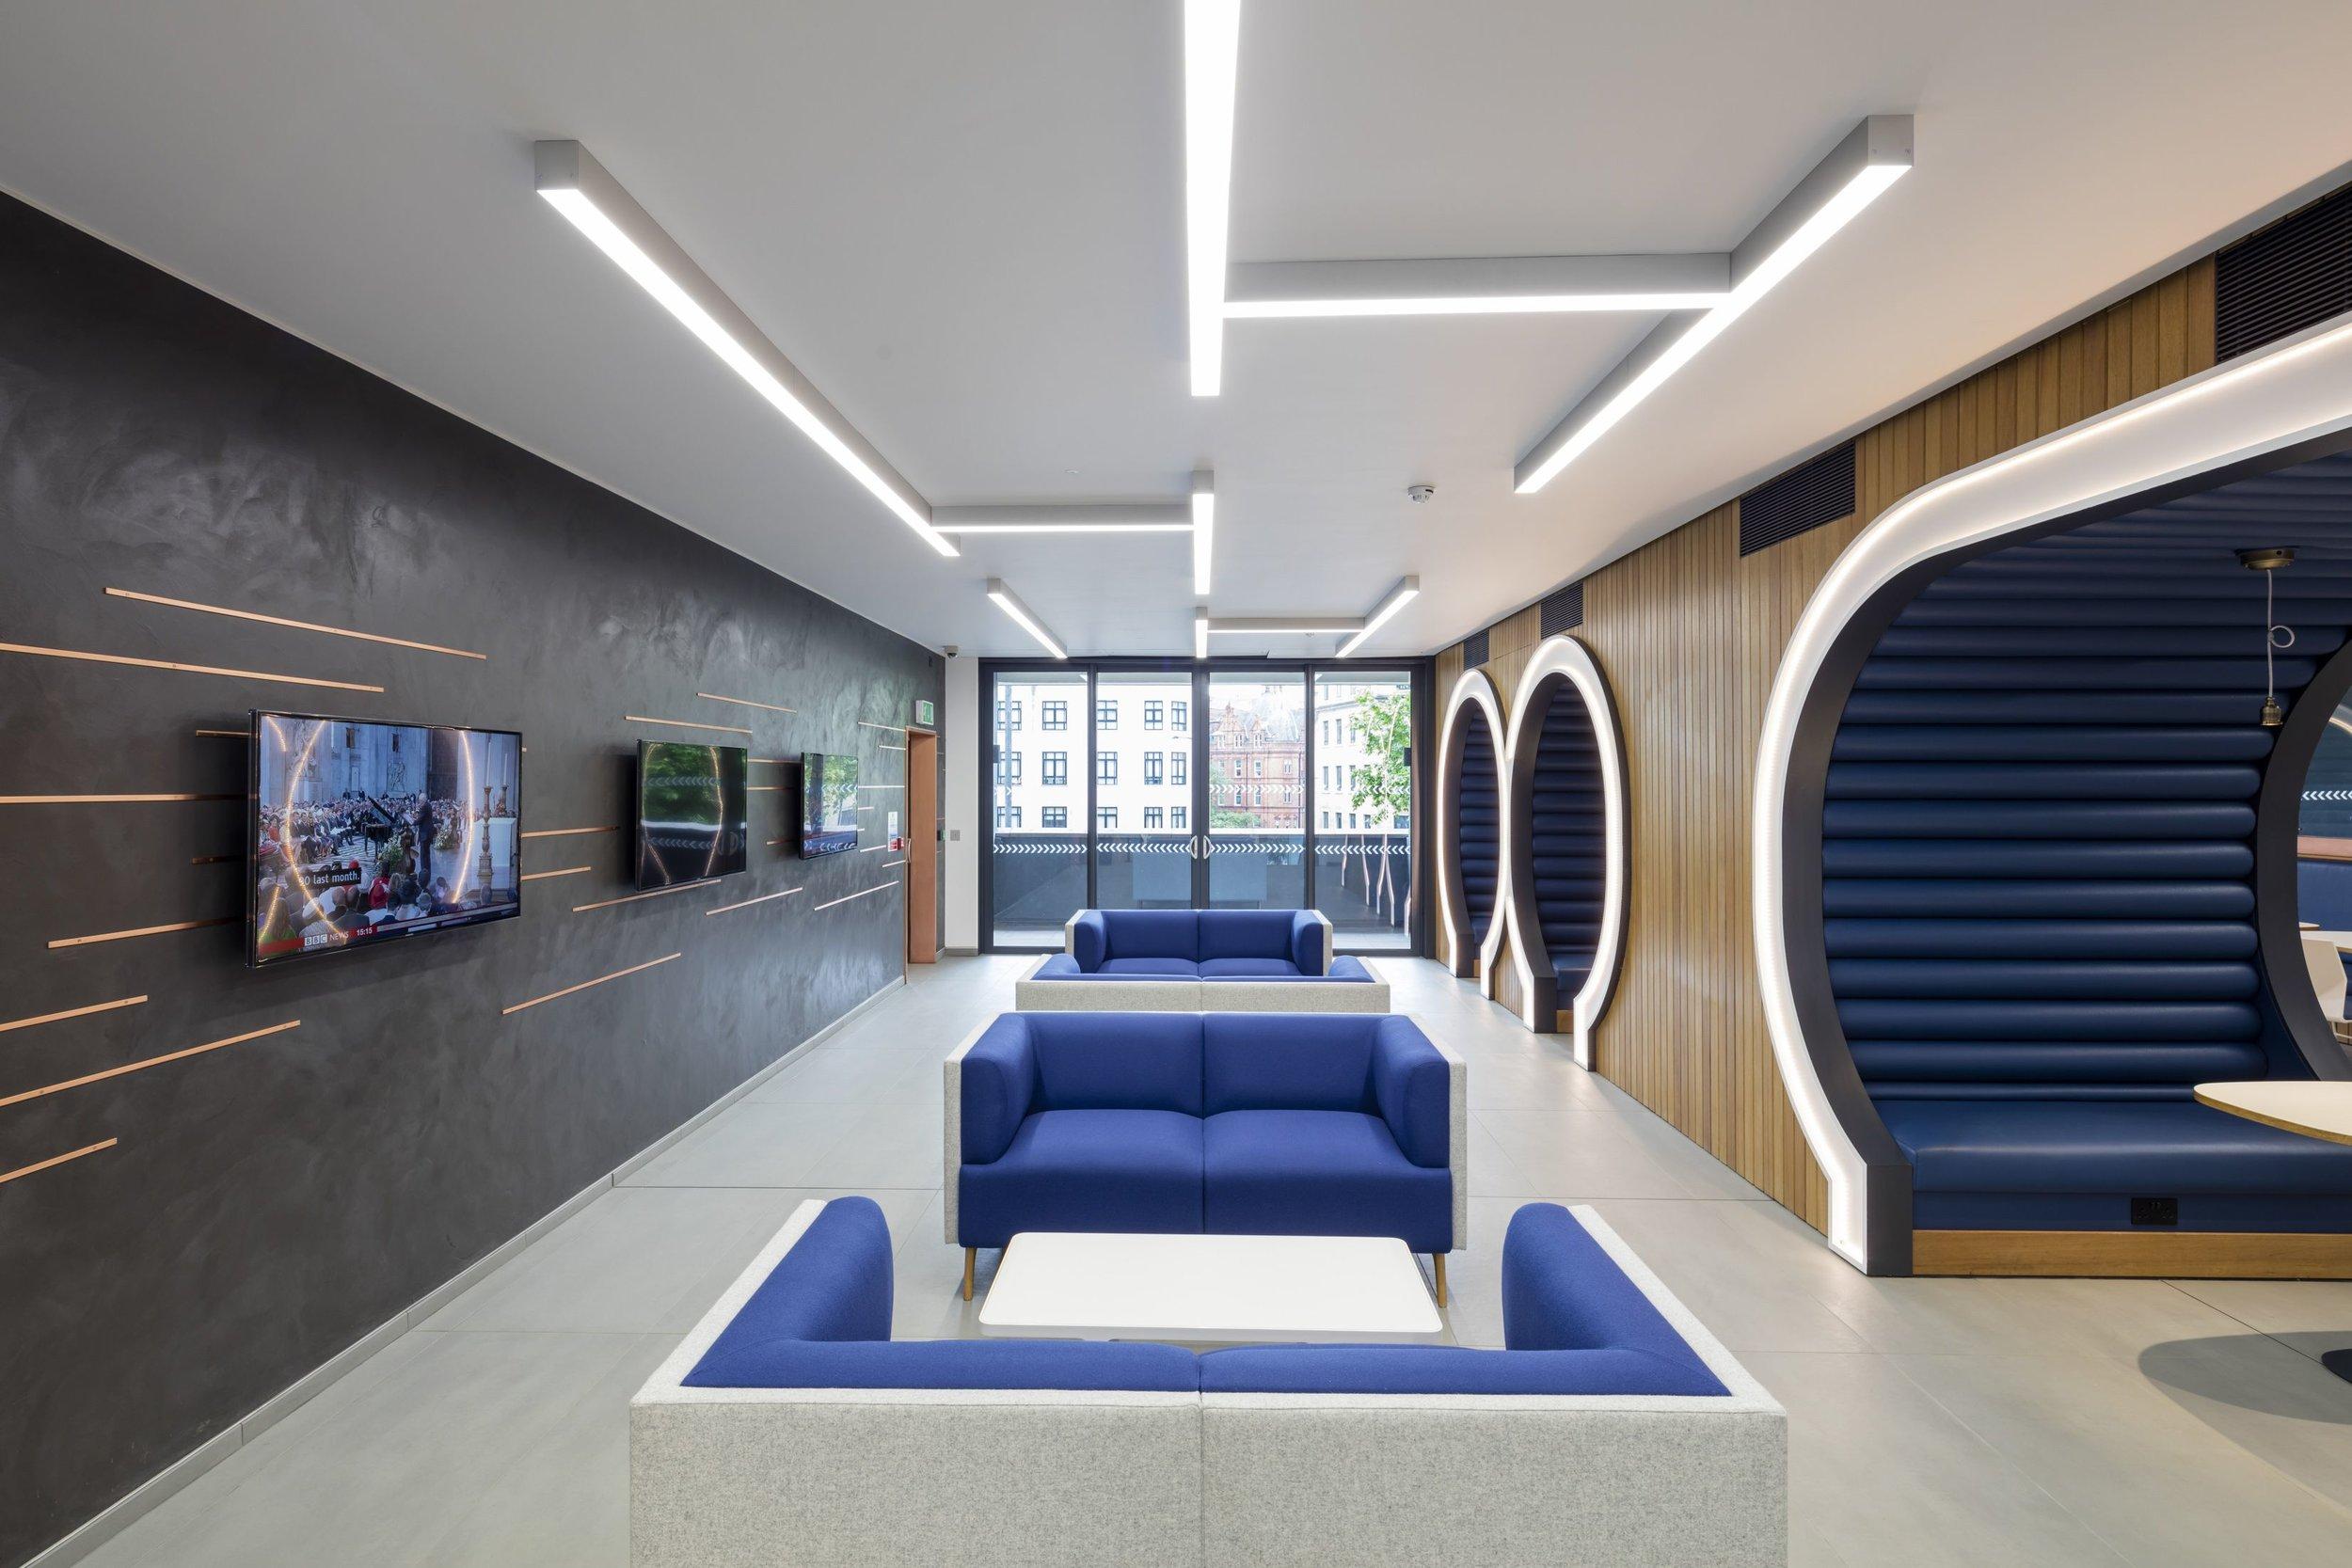 colston-tower-blue-sofa